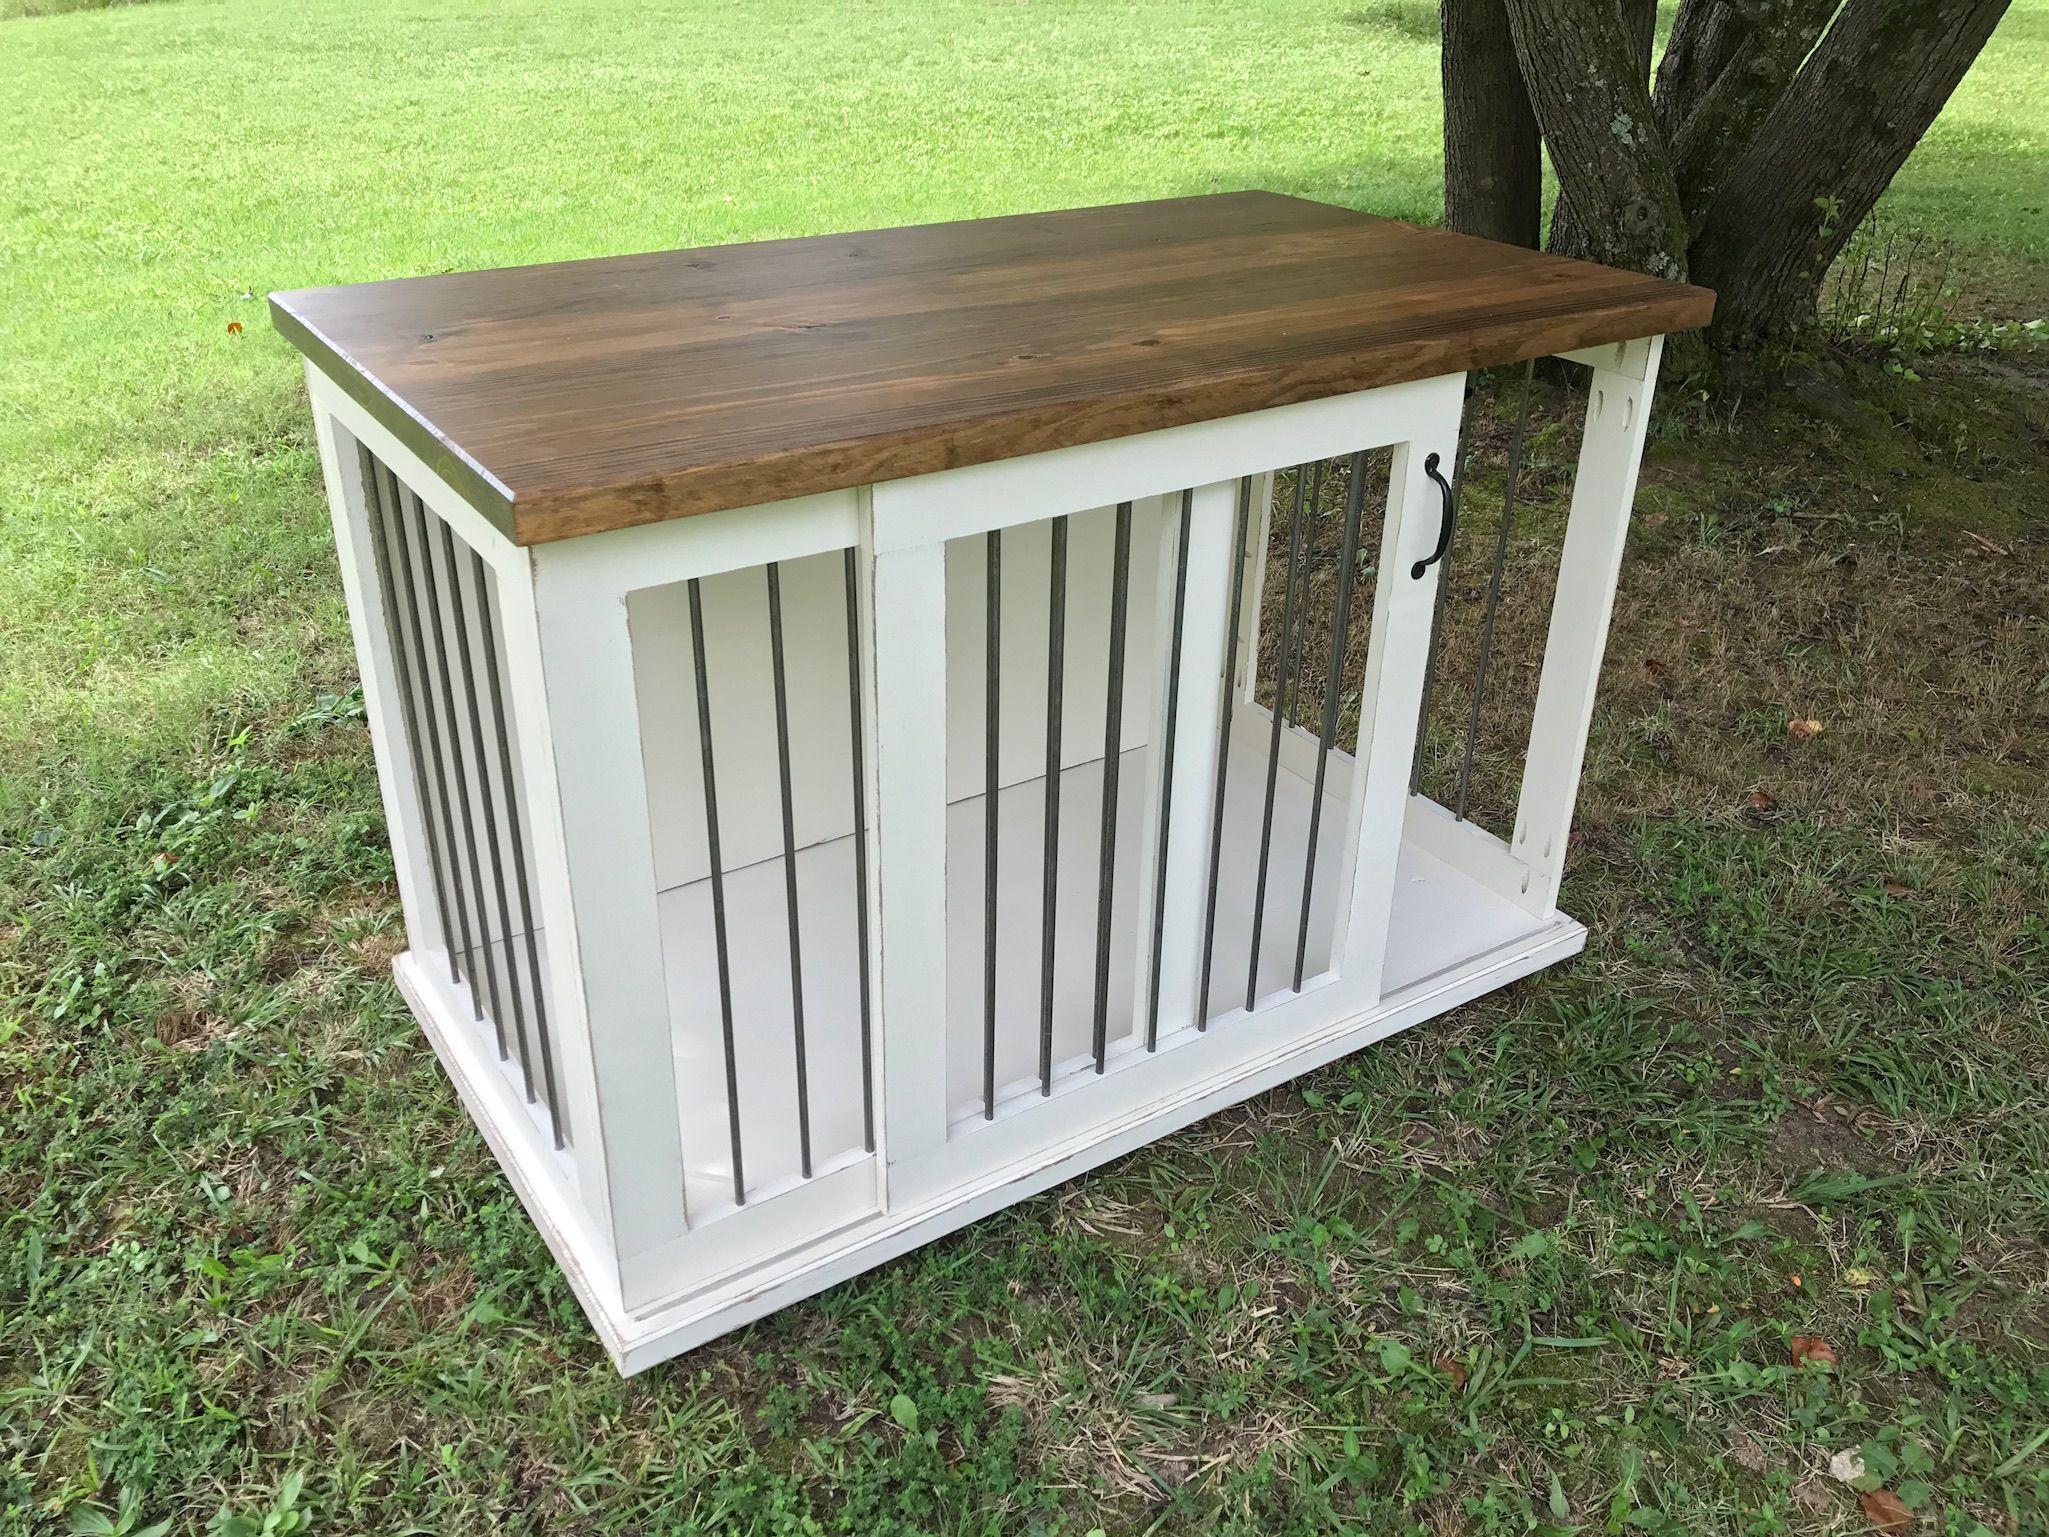 Antique White Dark Walnut Stained Custom Dog Kennel Crate Furniture Sliding Door Ingrained Builders Dog Crate Furniture Dog Furniture Wood Dog Crate